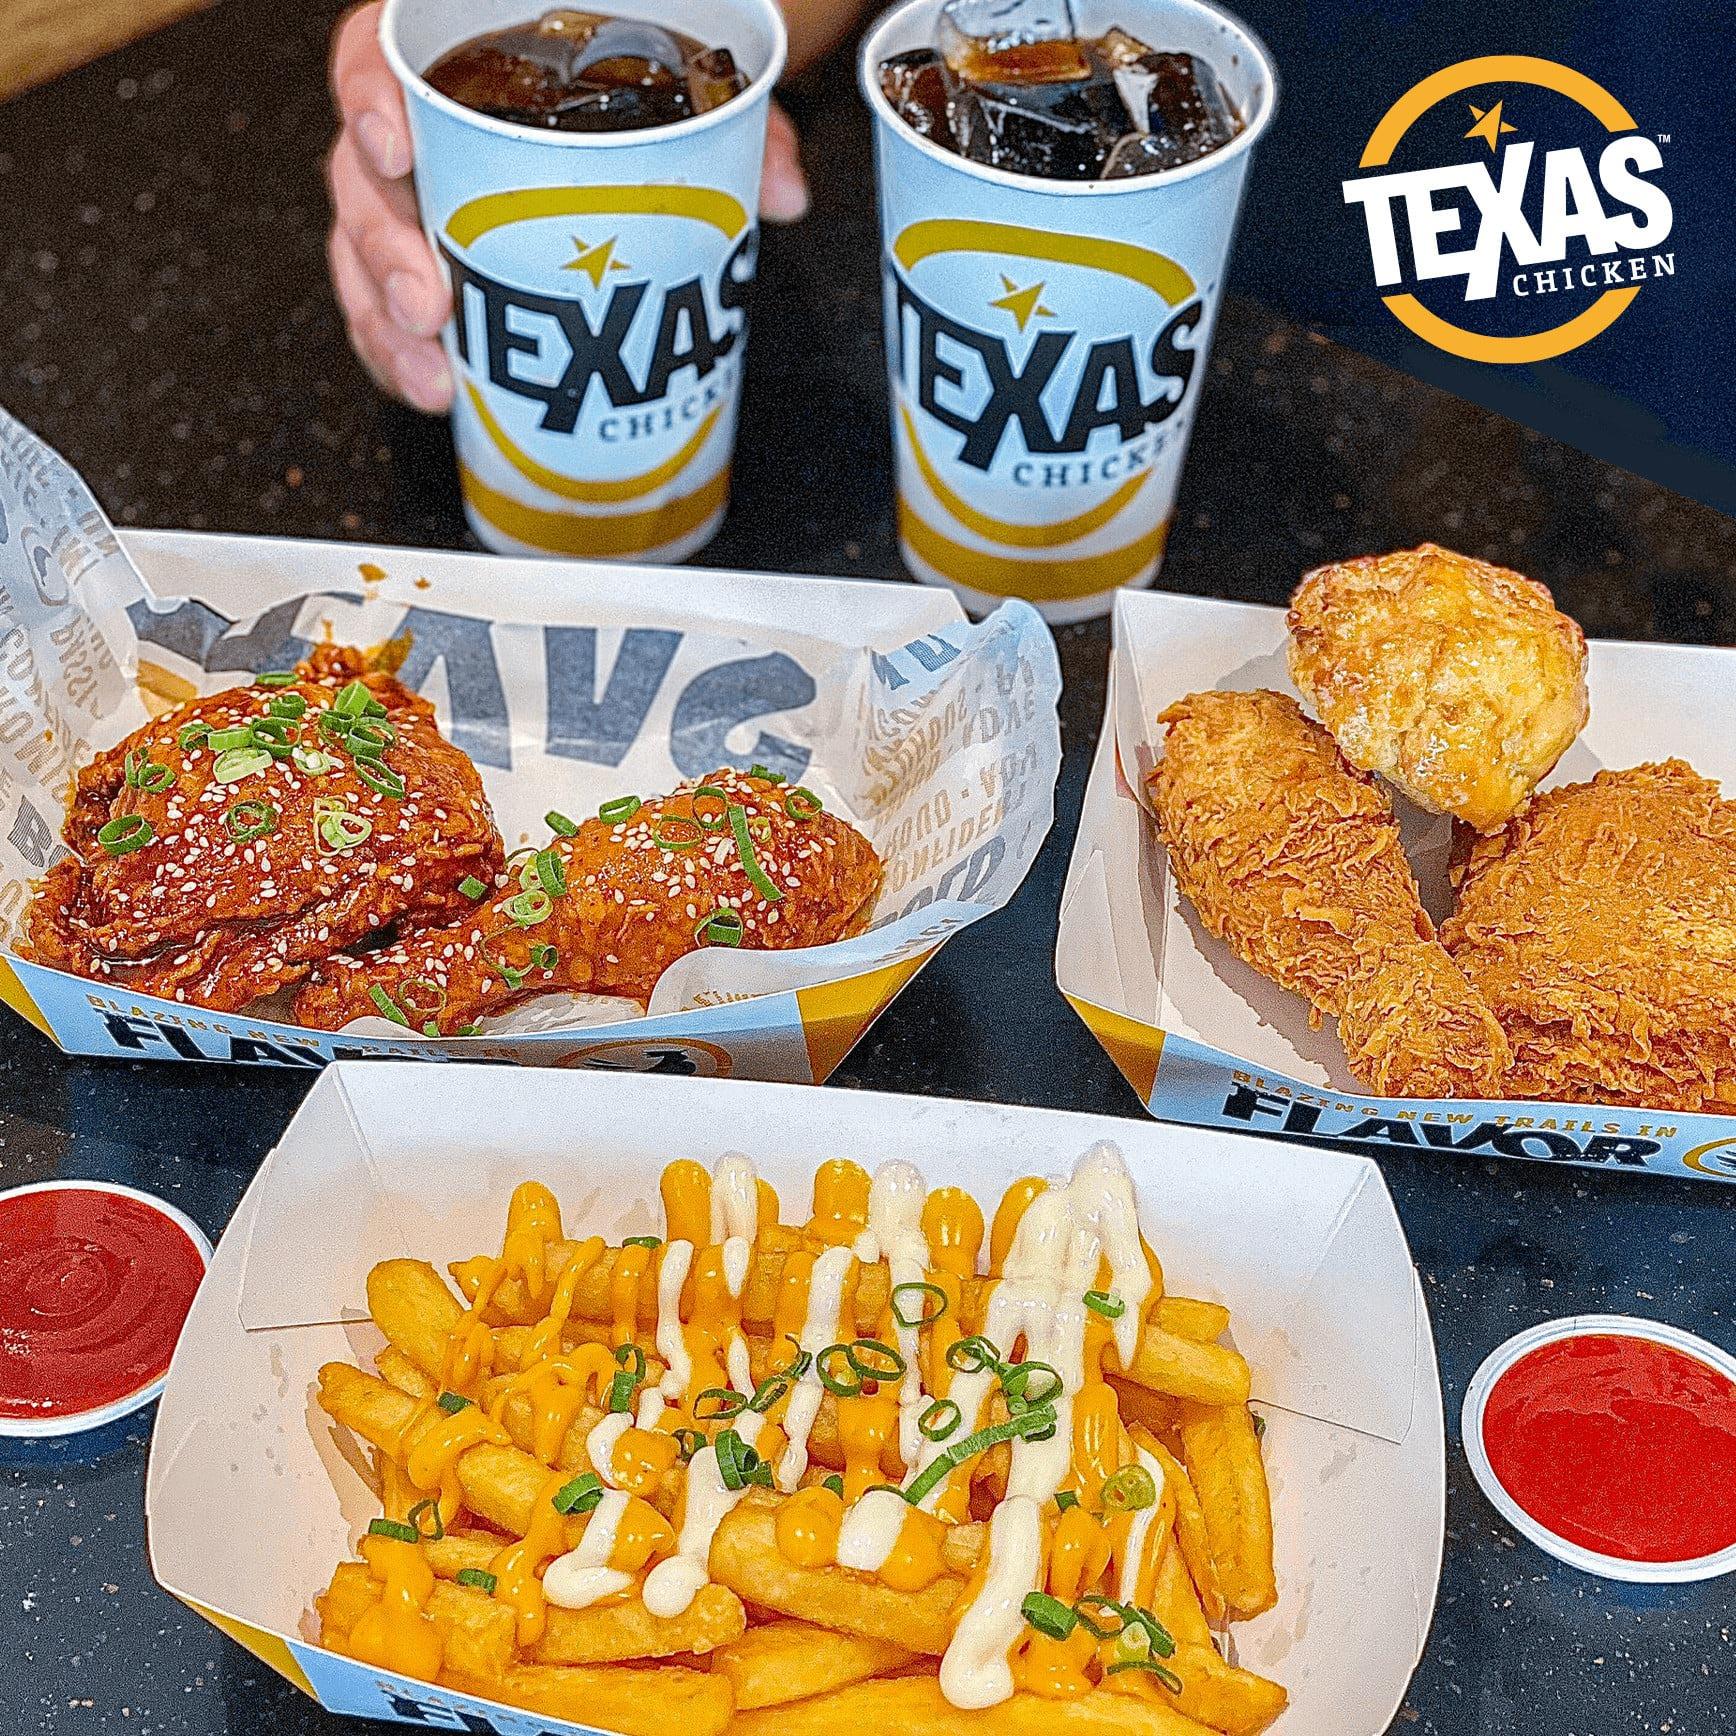 Aeon mall Texas Chicken